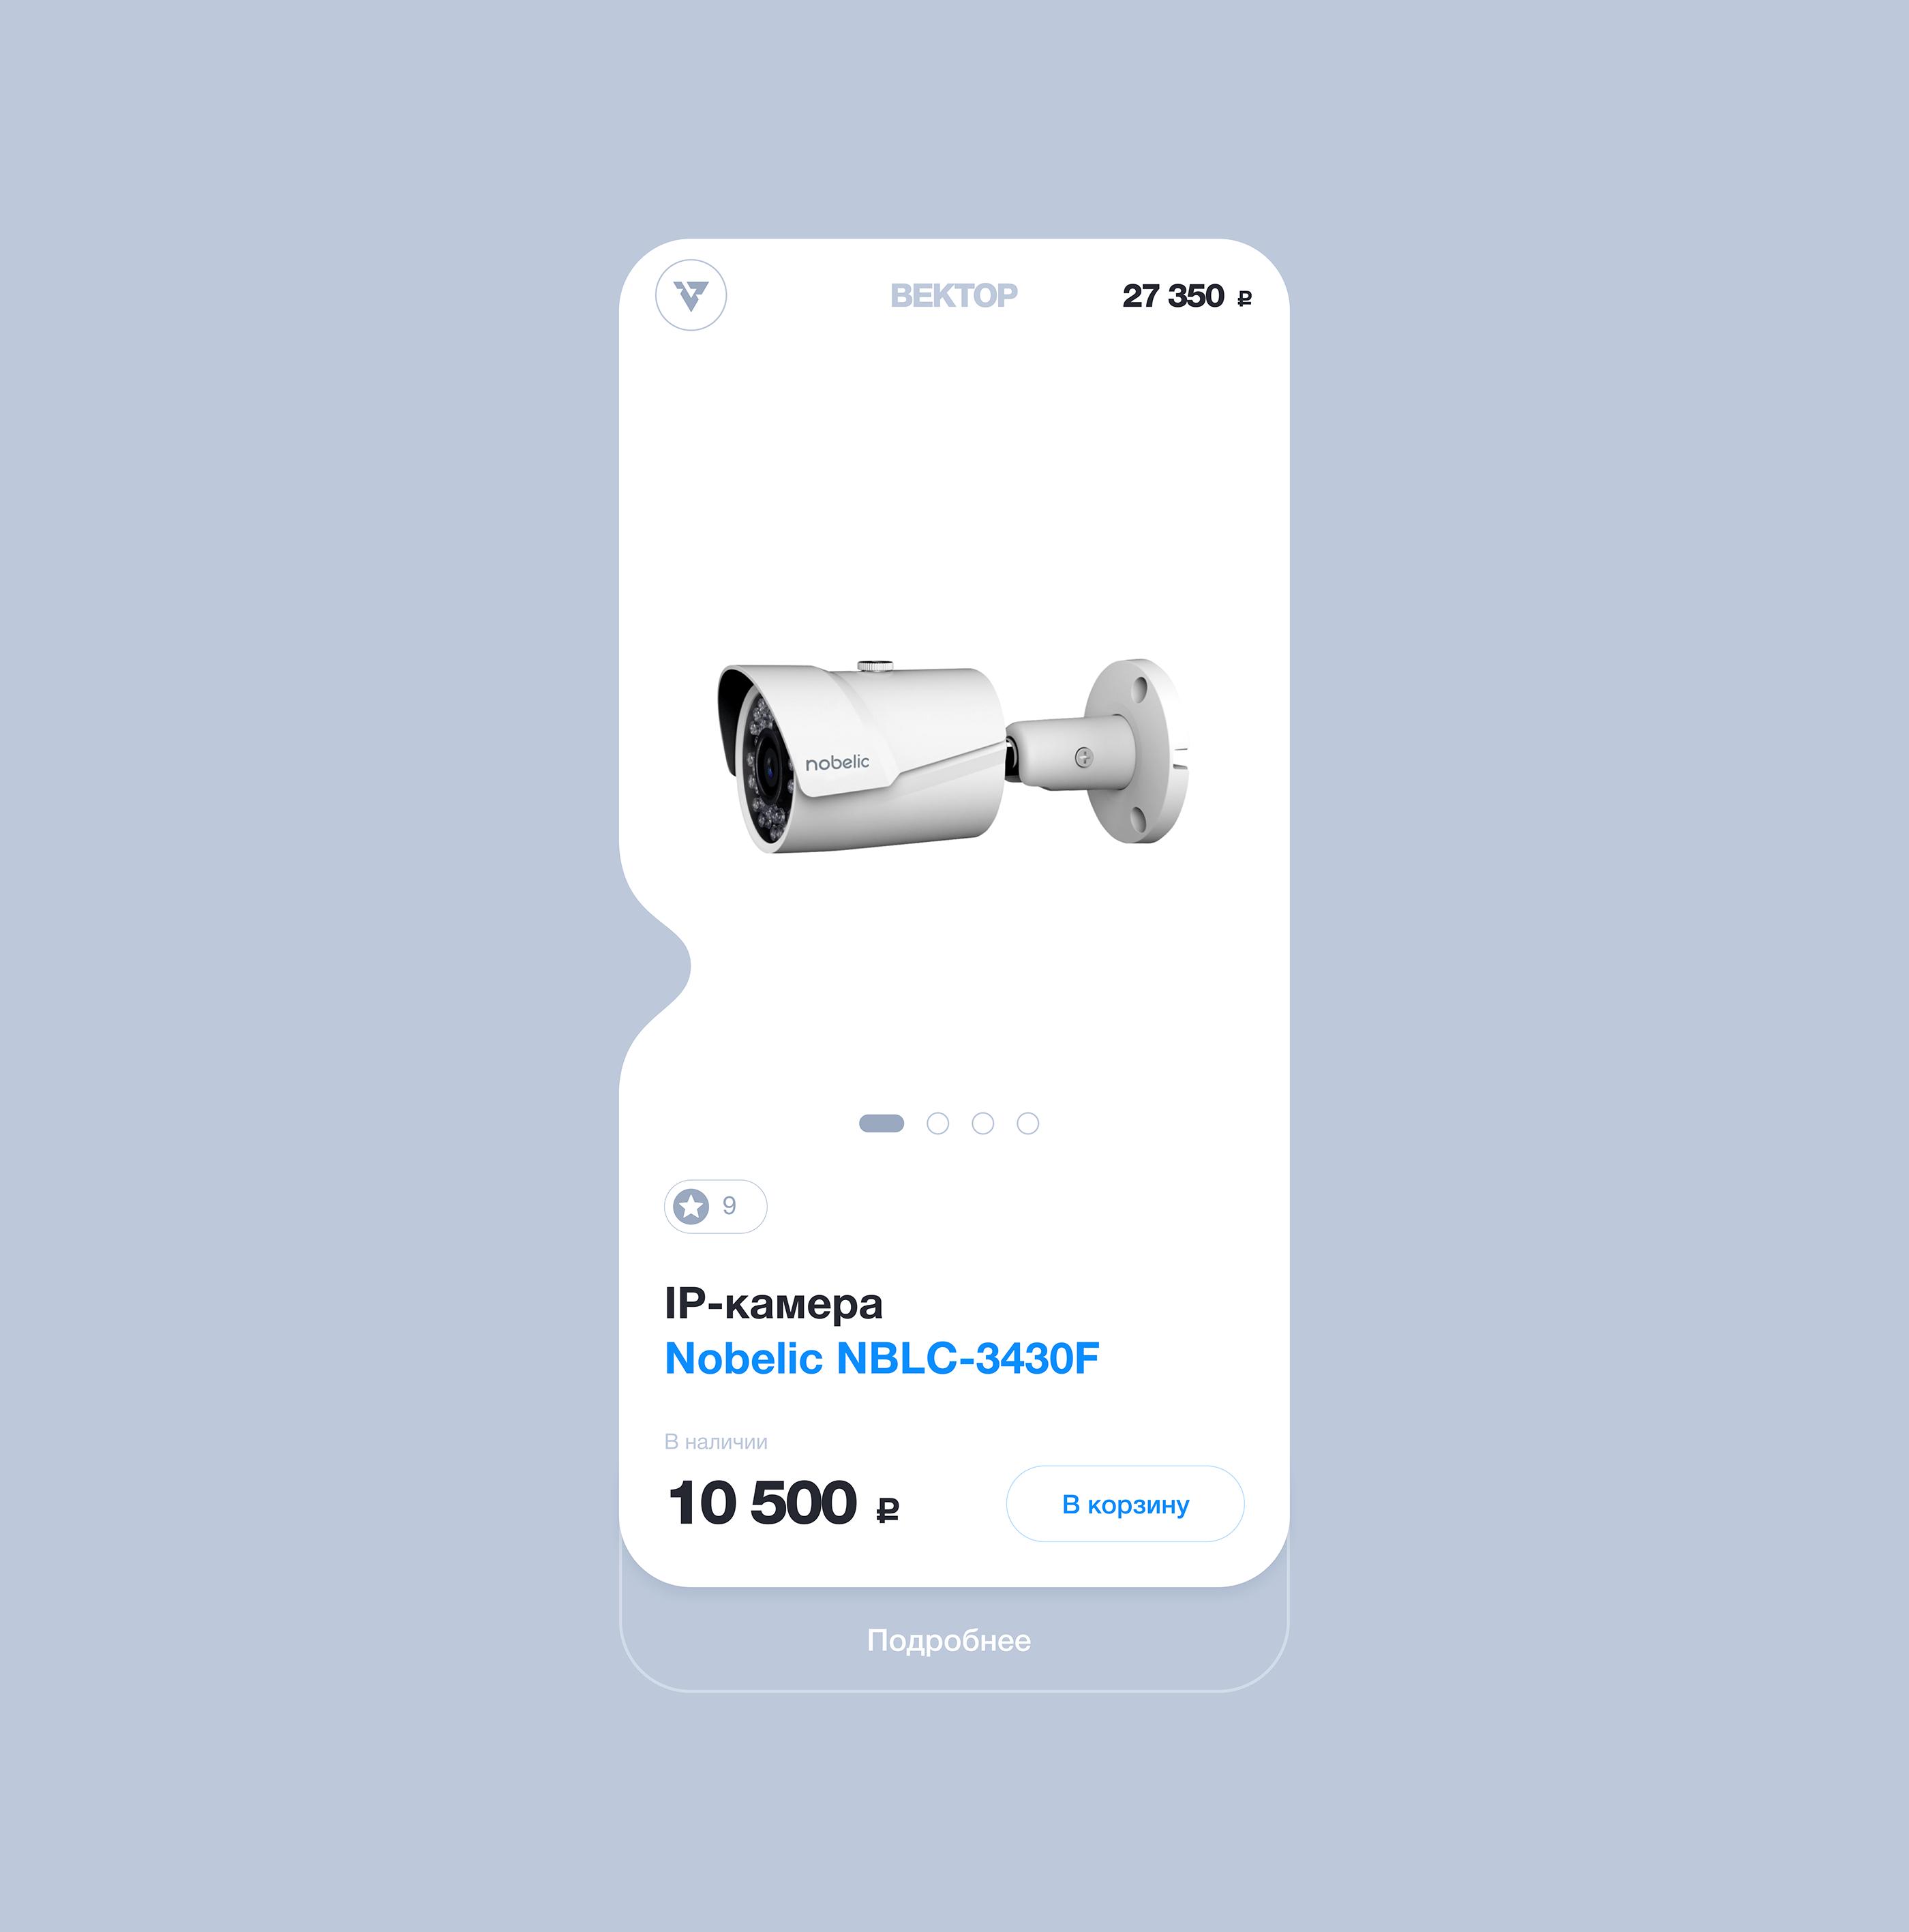 Вектор 2019